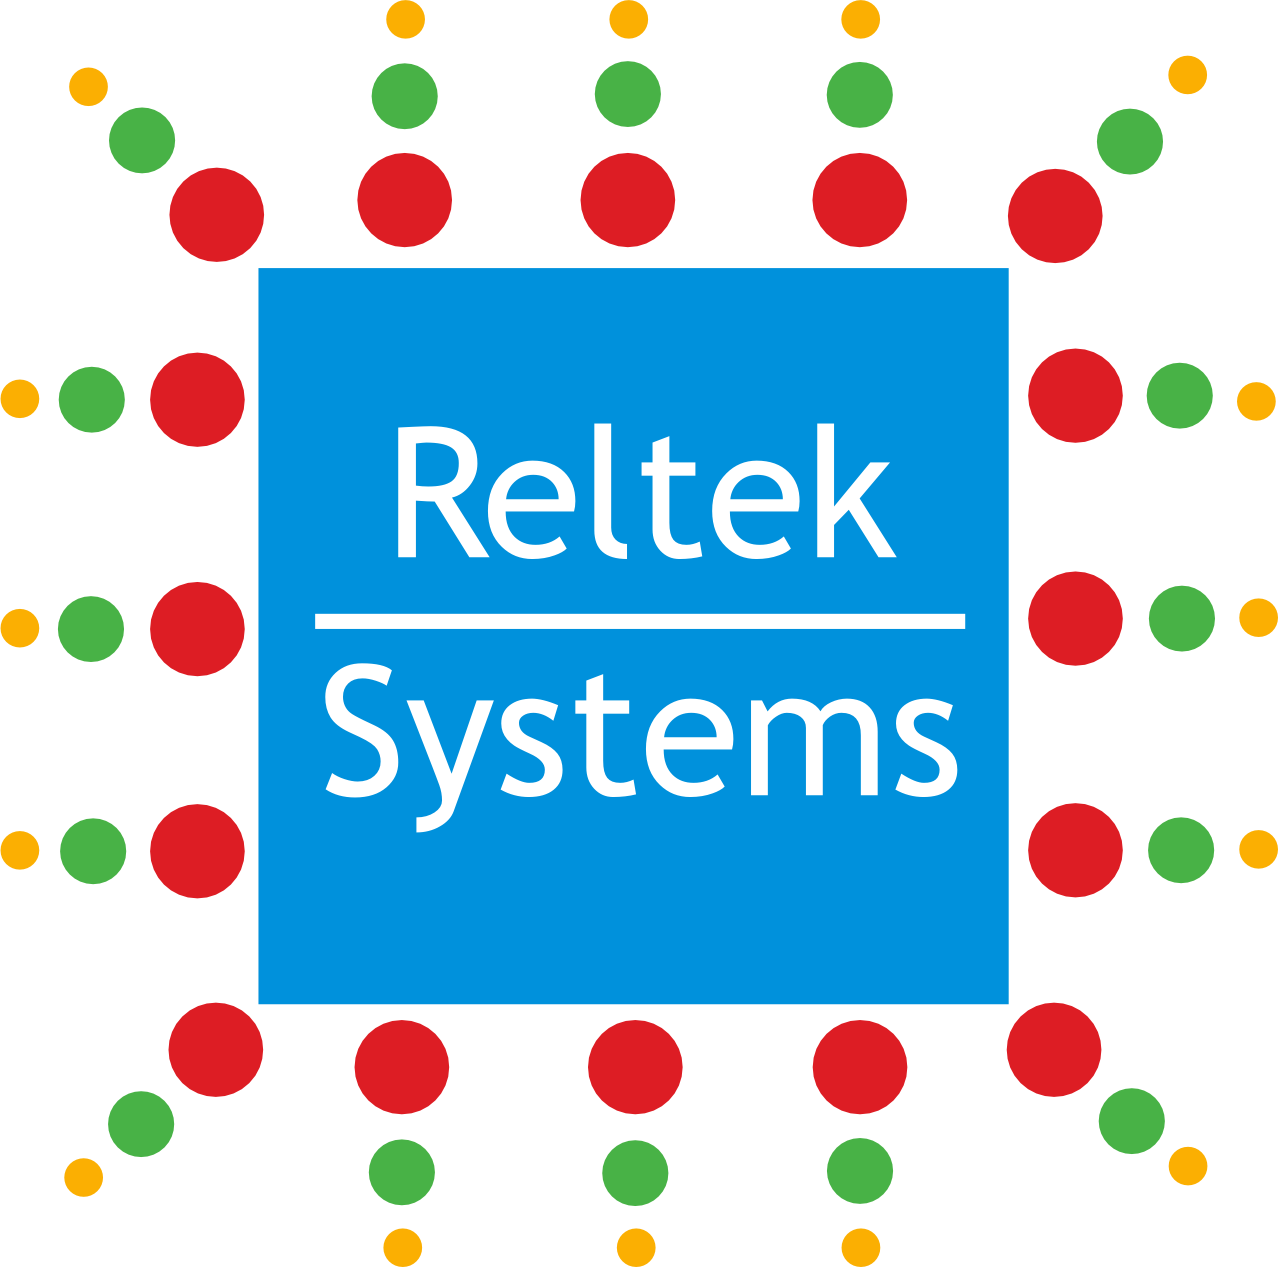 Reltek Systems